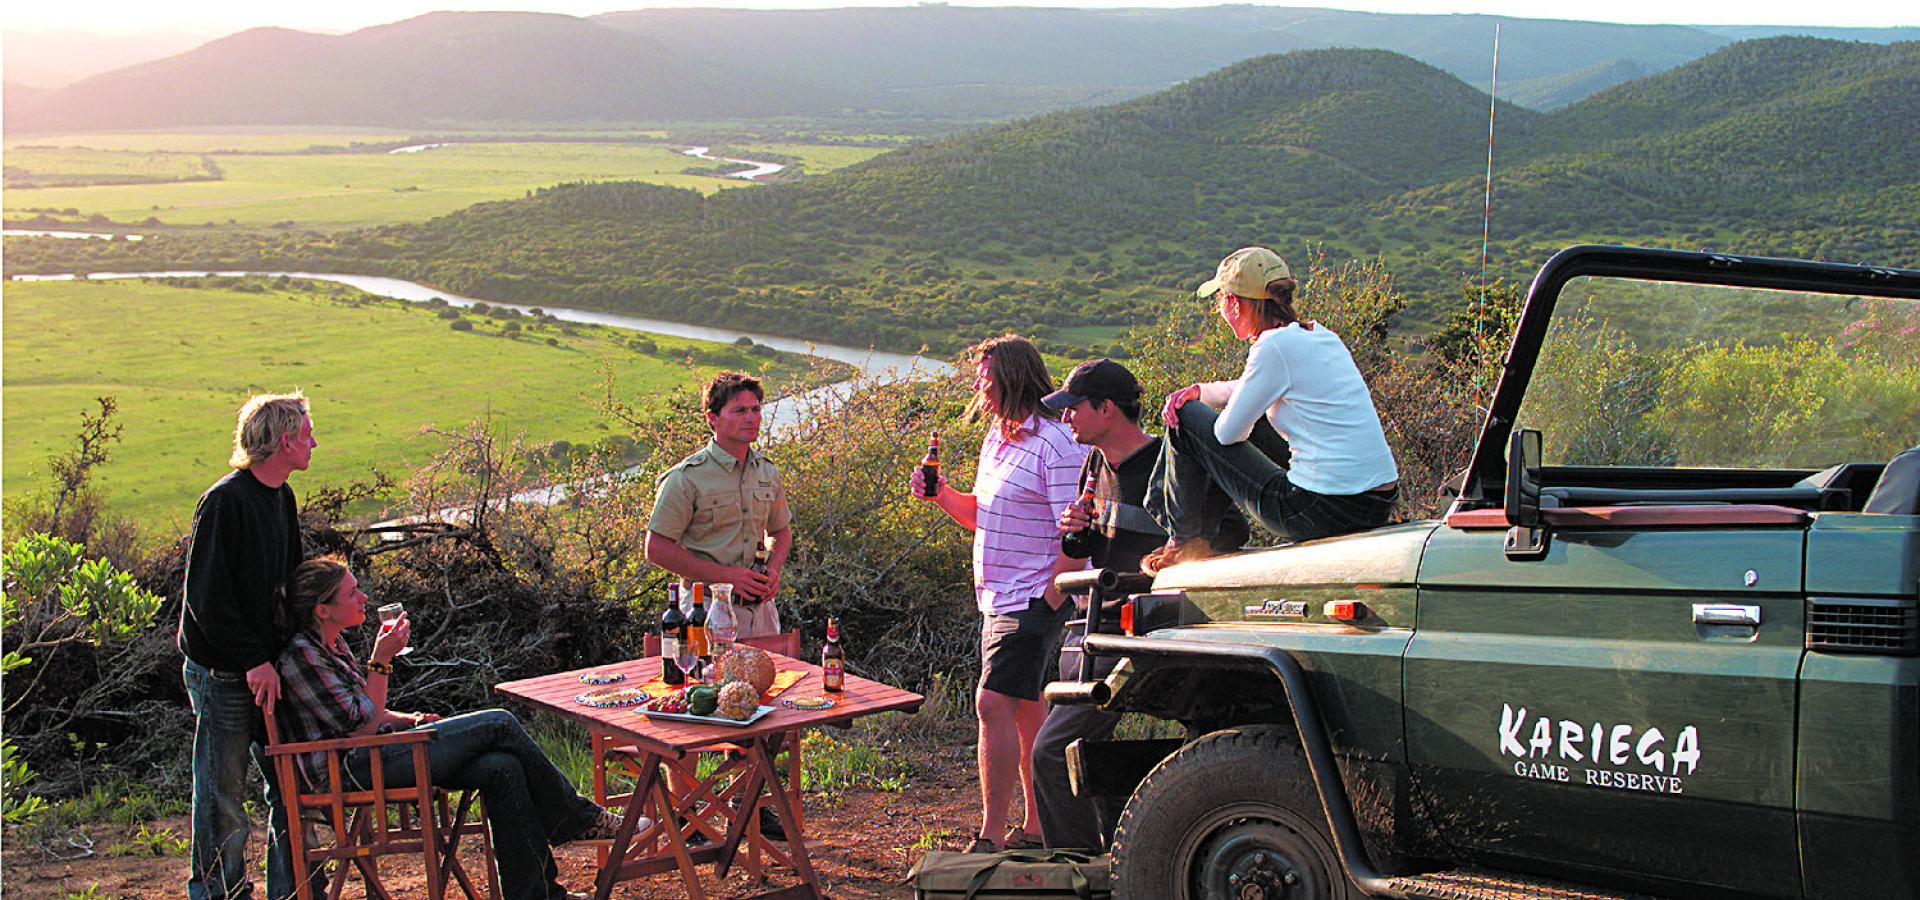 Sundowner im Kariega Game Reserve